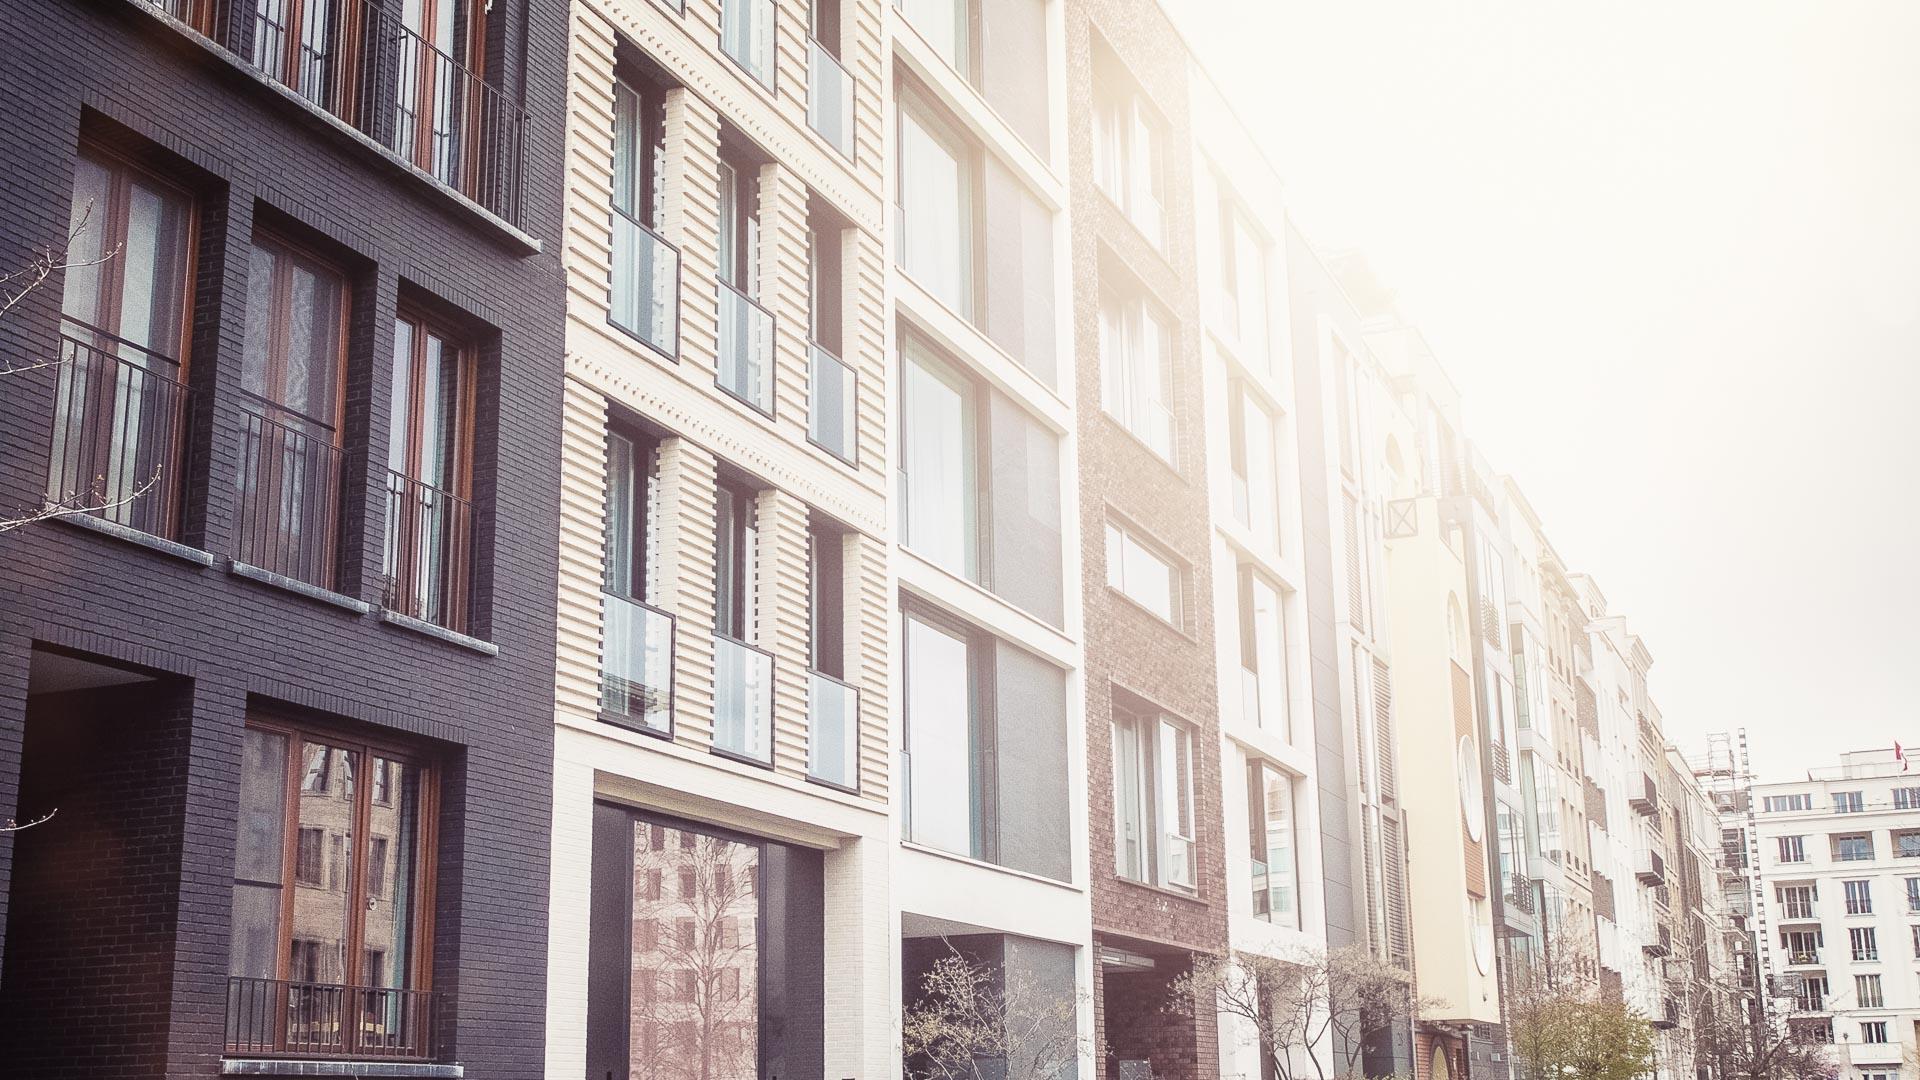 Immobiliengutachter Stuttgart ihr experte in stuttgart ludwigsburg umgebung goldwert immobilien